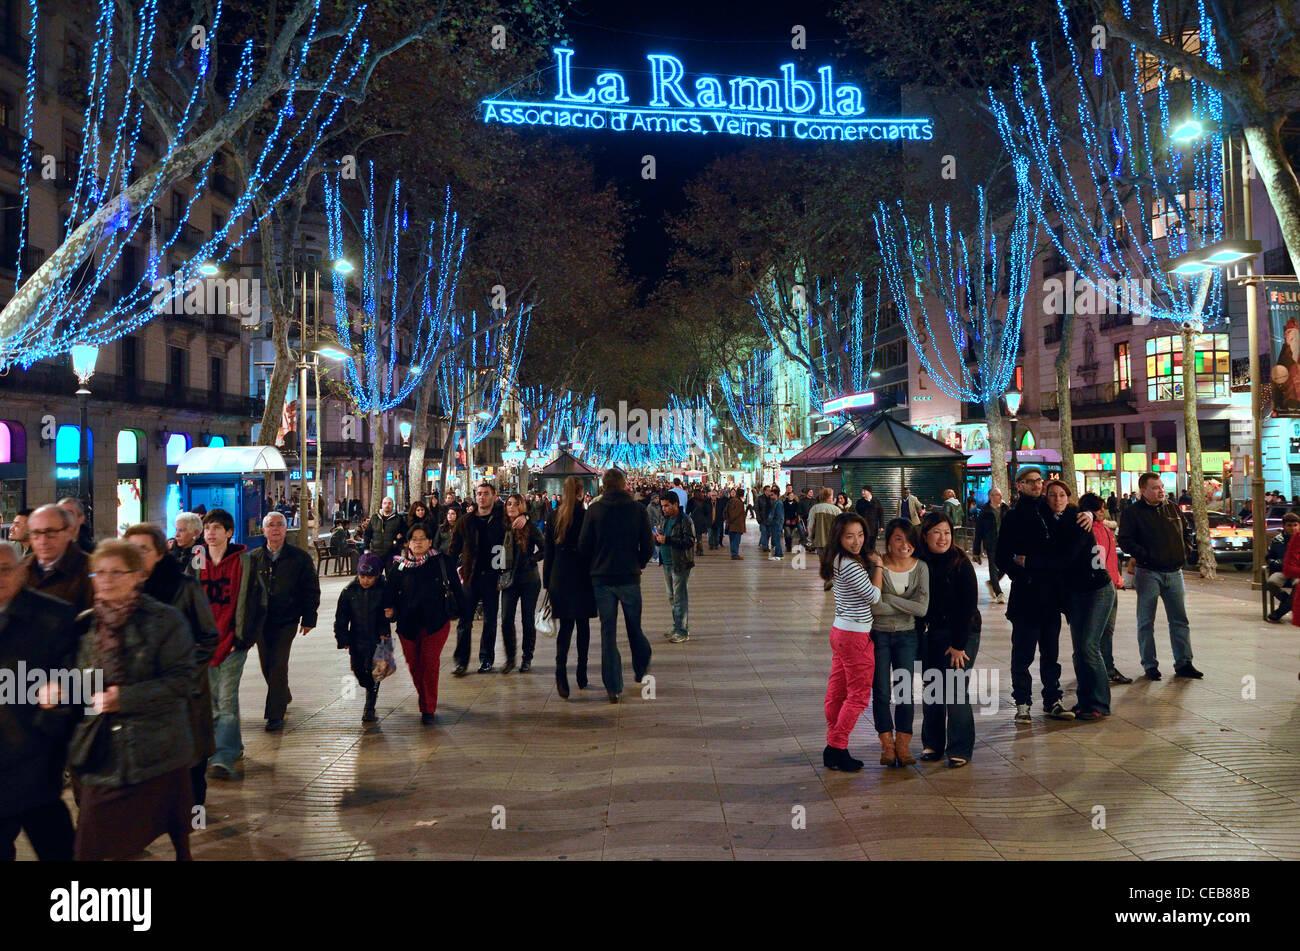 Barcelona, Spain. Christmas lights in La Rambla, 2011 - Stock Image